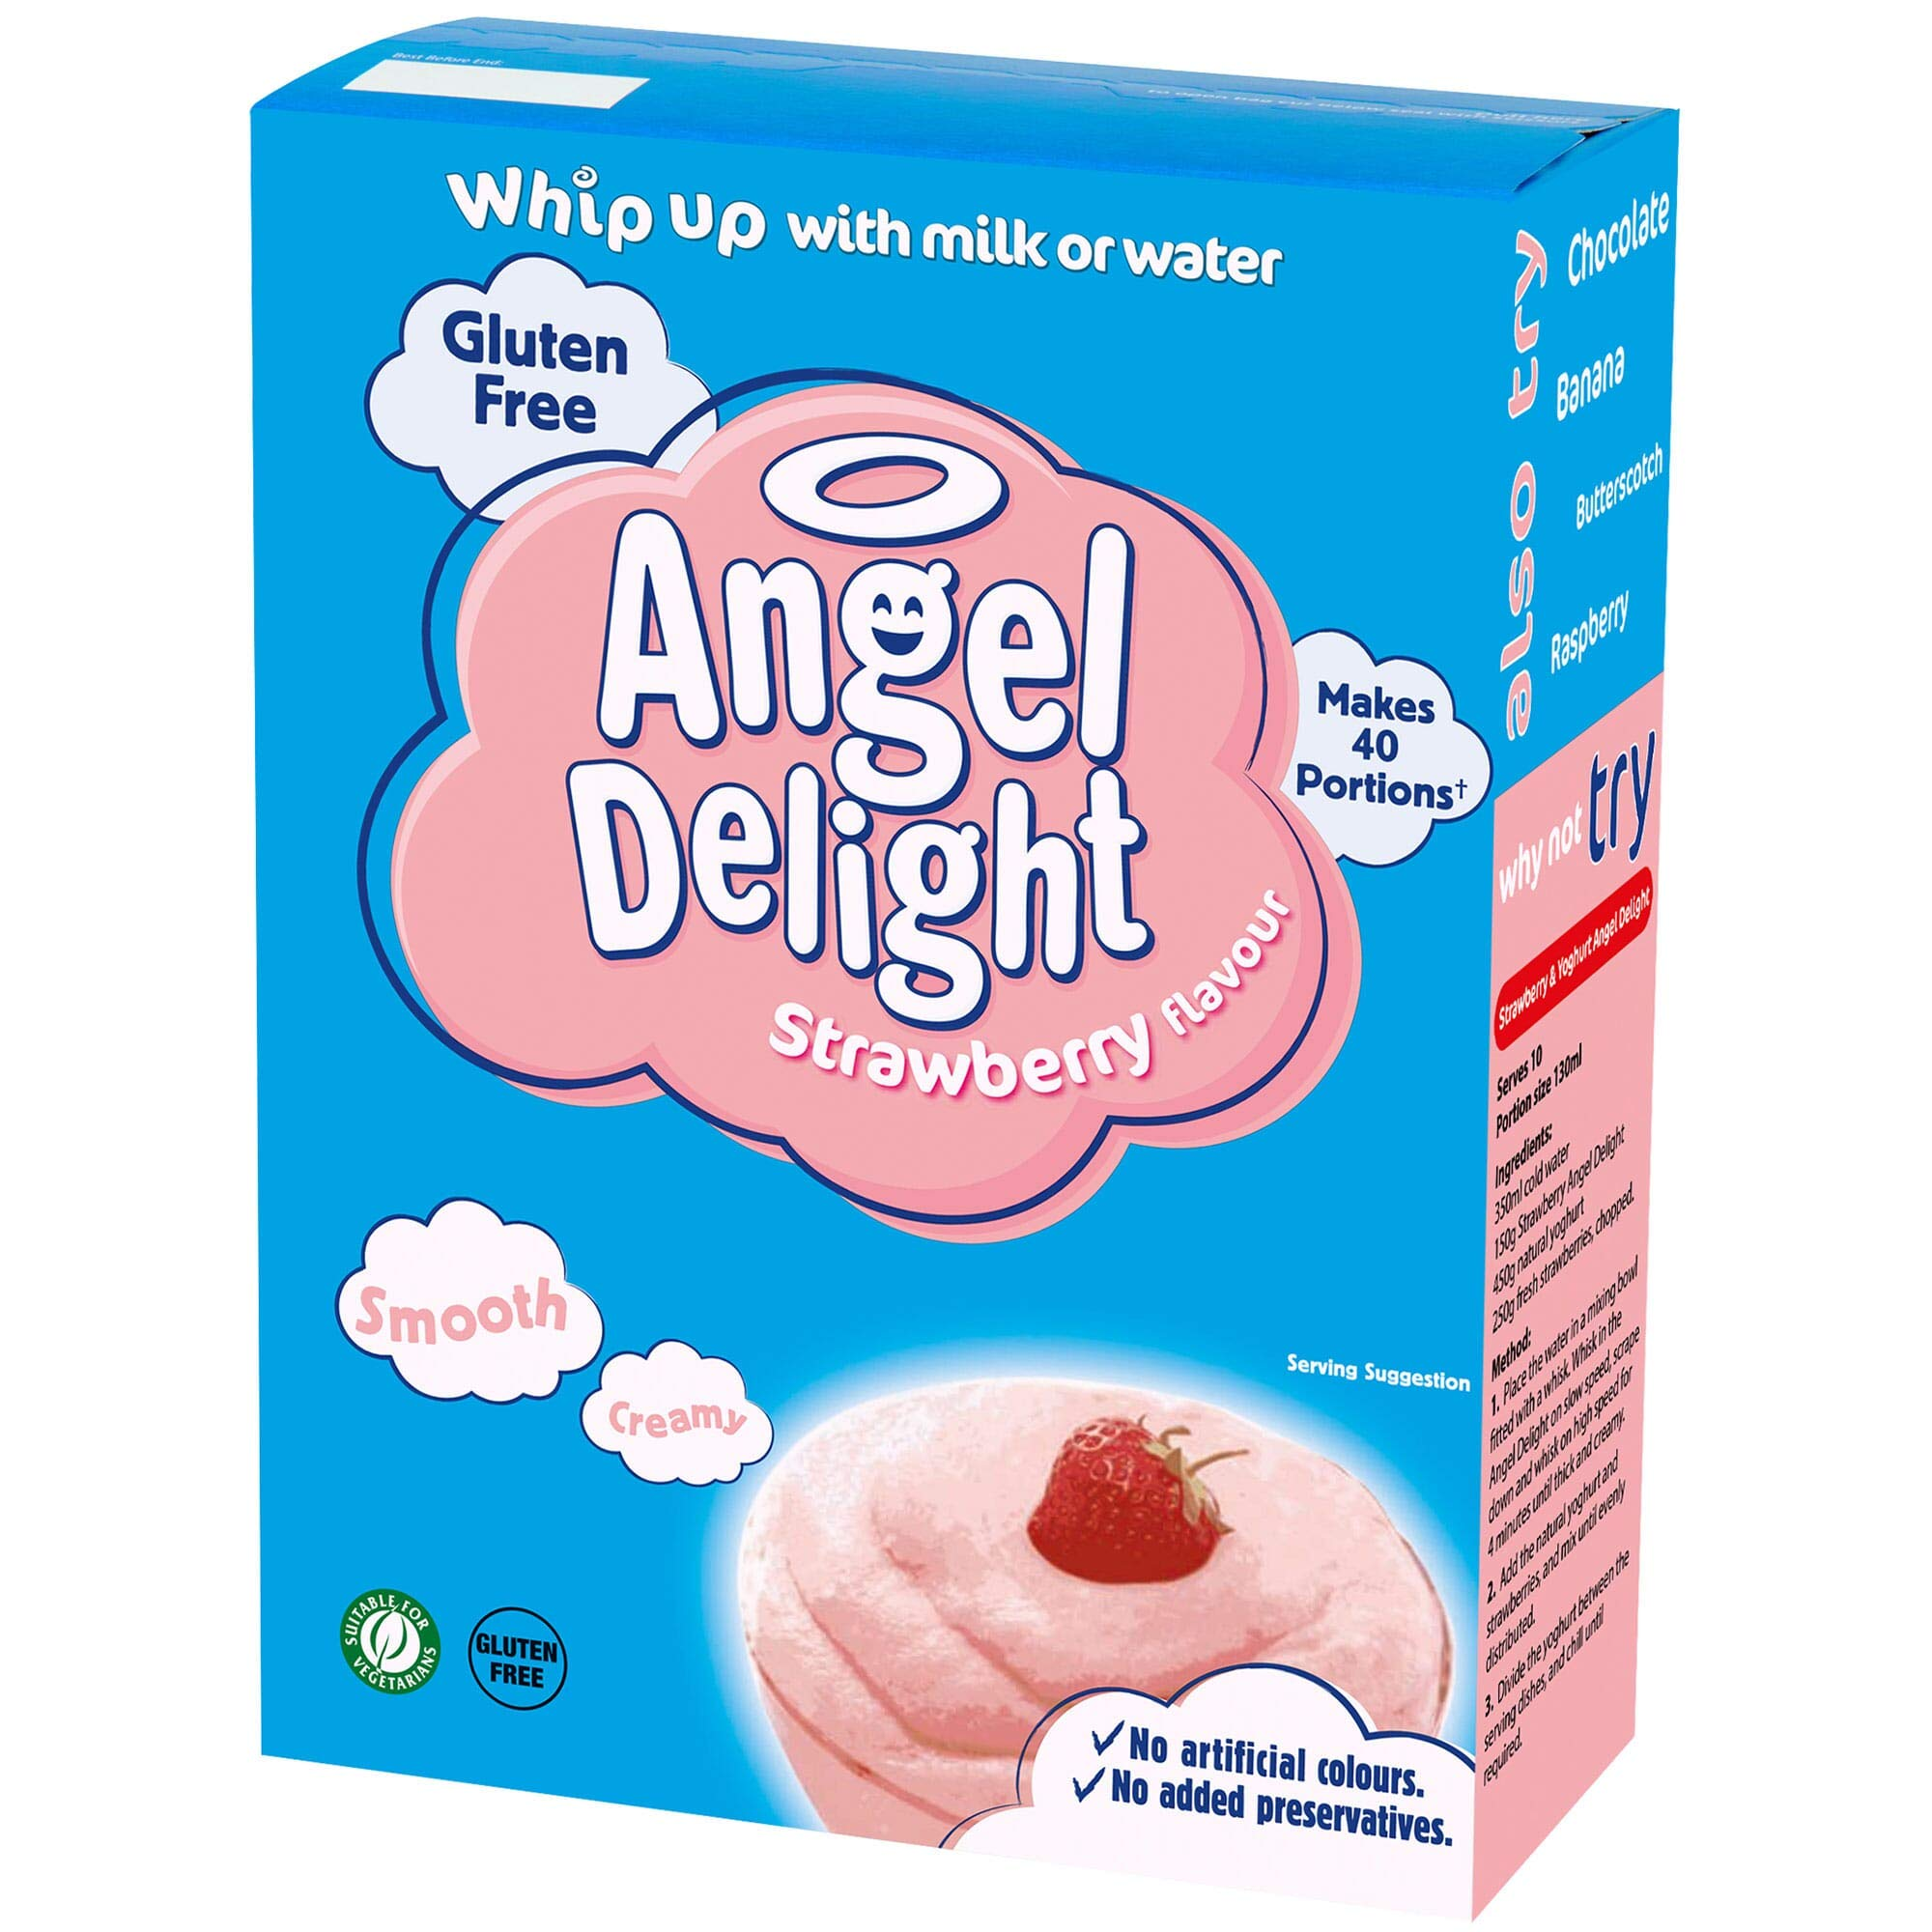 Angel Delight Strawberry Flavour Dessert Mix - 1x24ptn